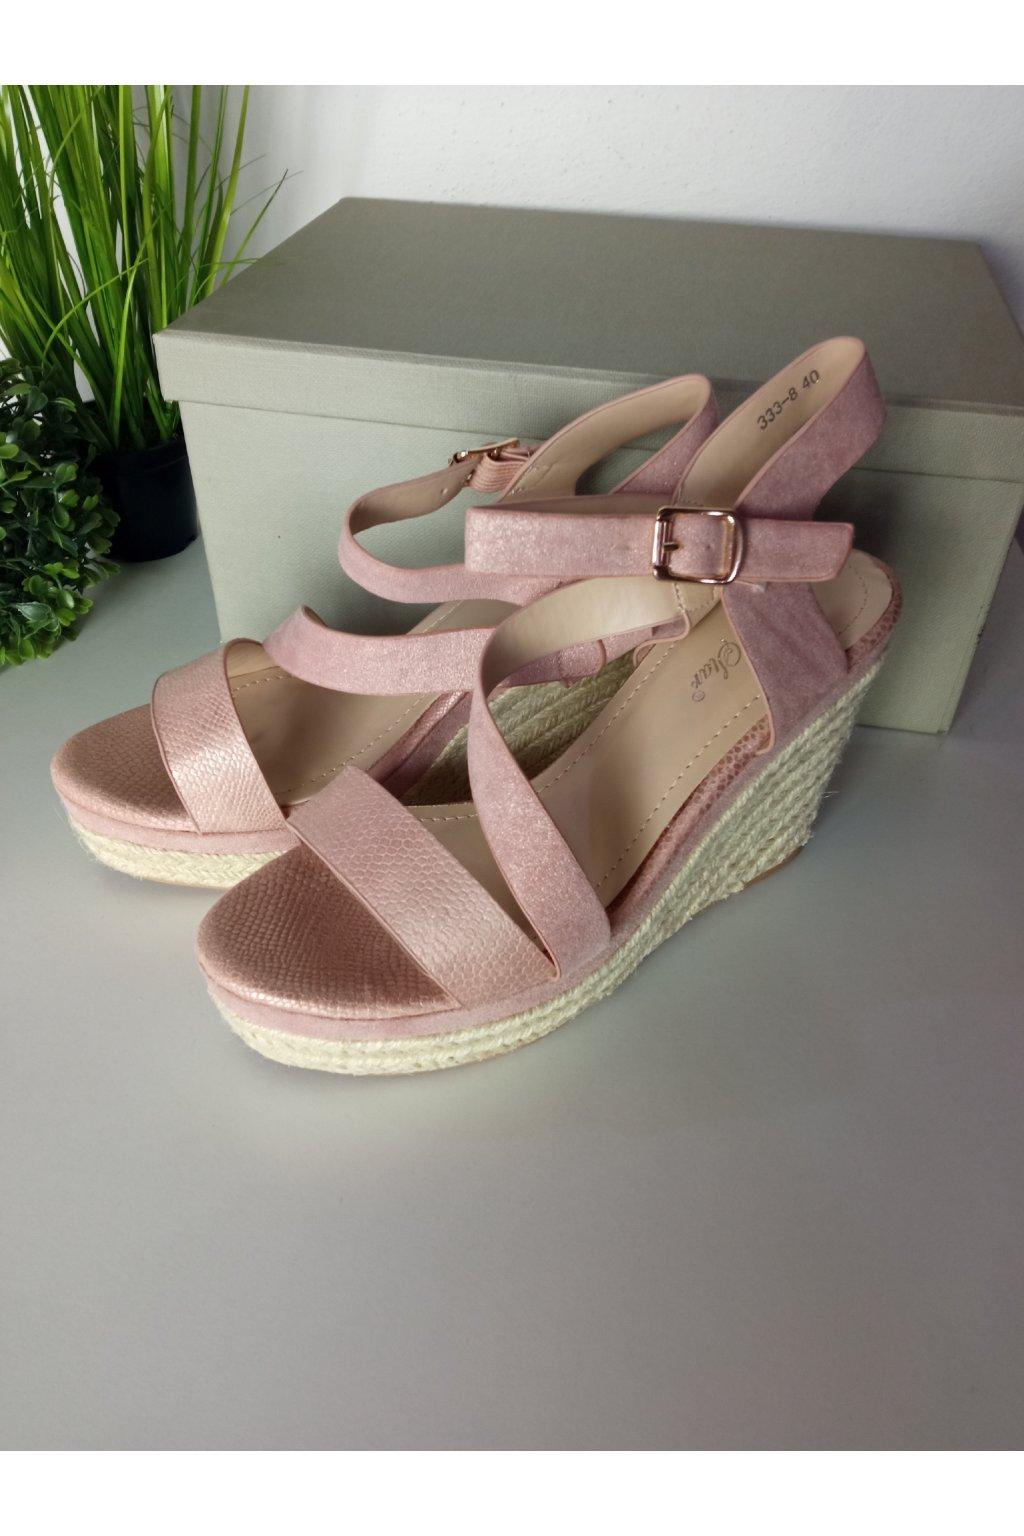 Ružové sandále NJSK 333-8